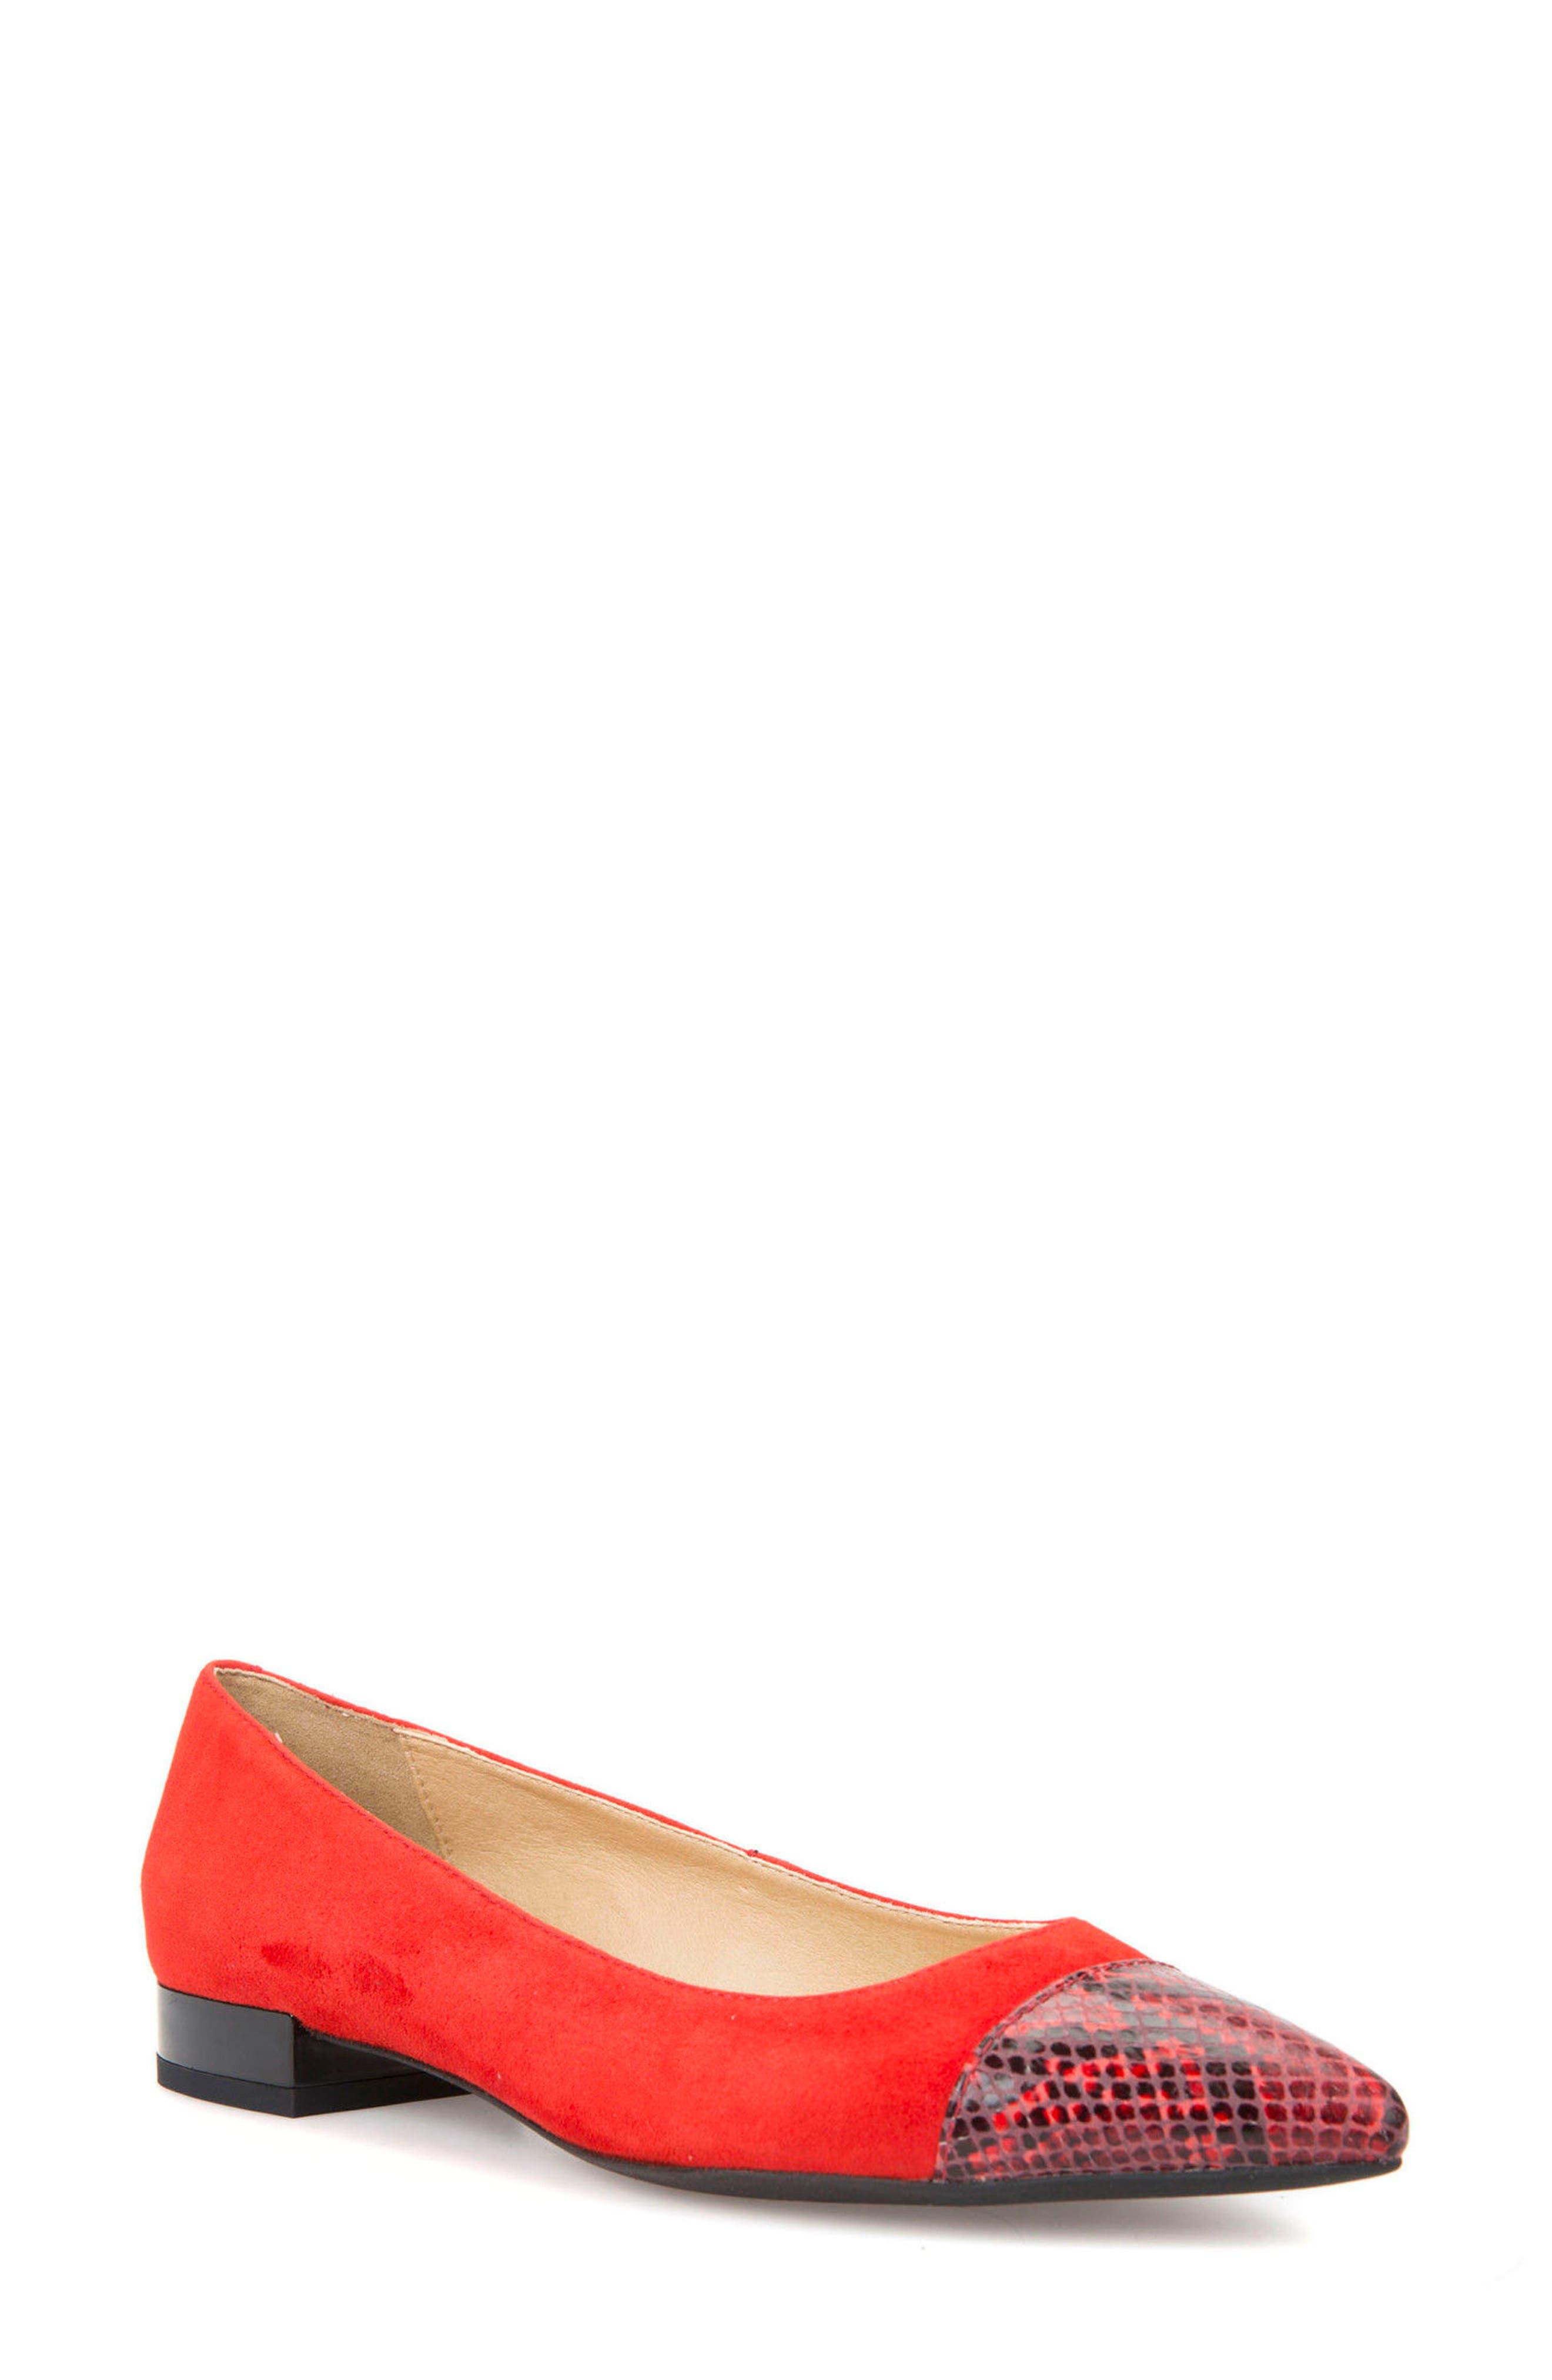 Charyssa Flat,                         Main,                         color, Scarlet Leather